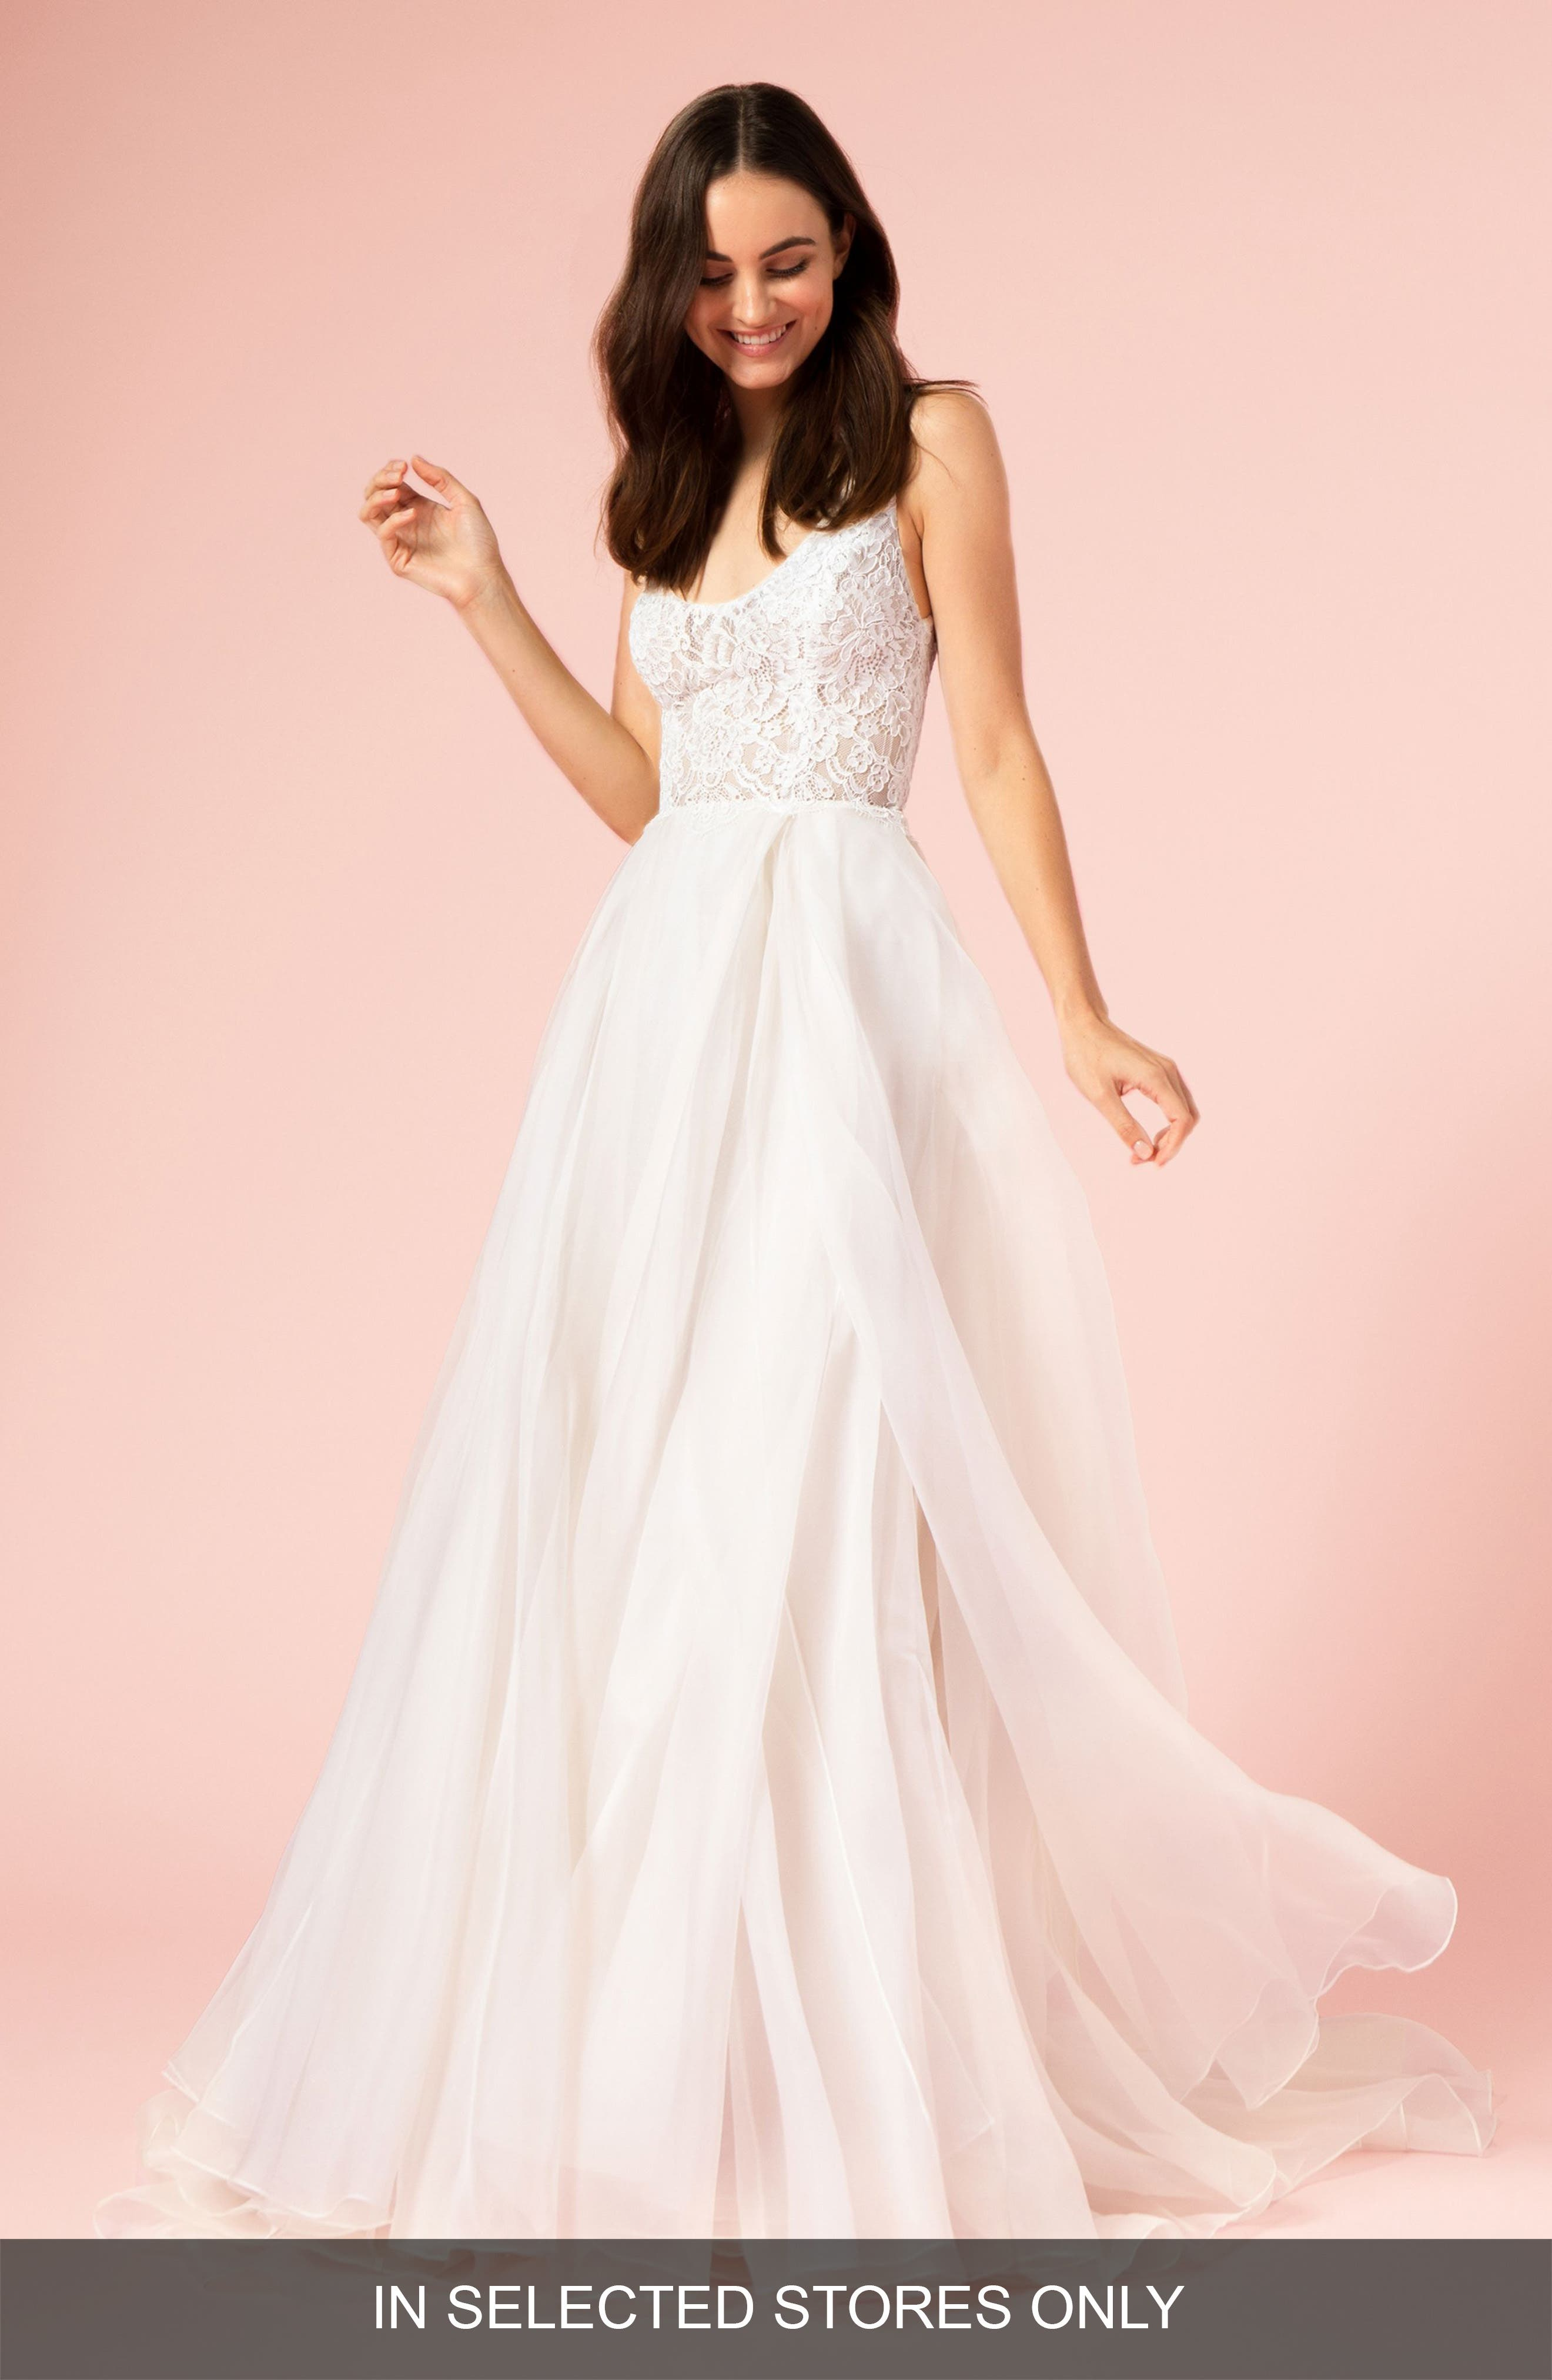 Alternate Image 1 Selected - BLISS Monique Lhuillier Lace Bodice Gown